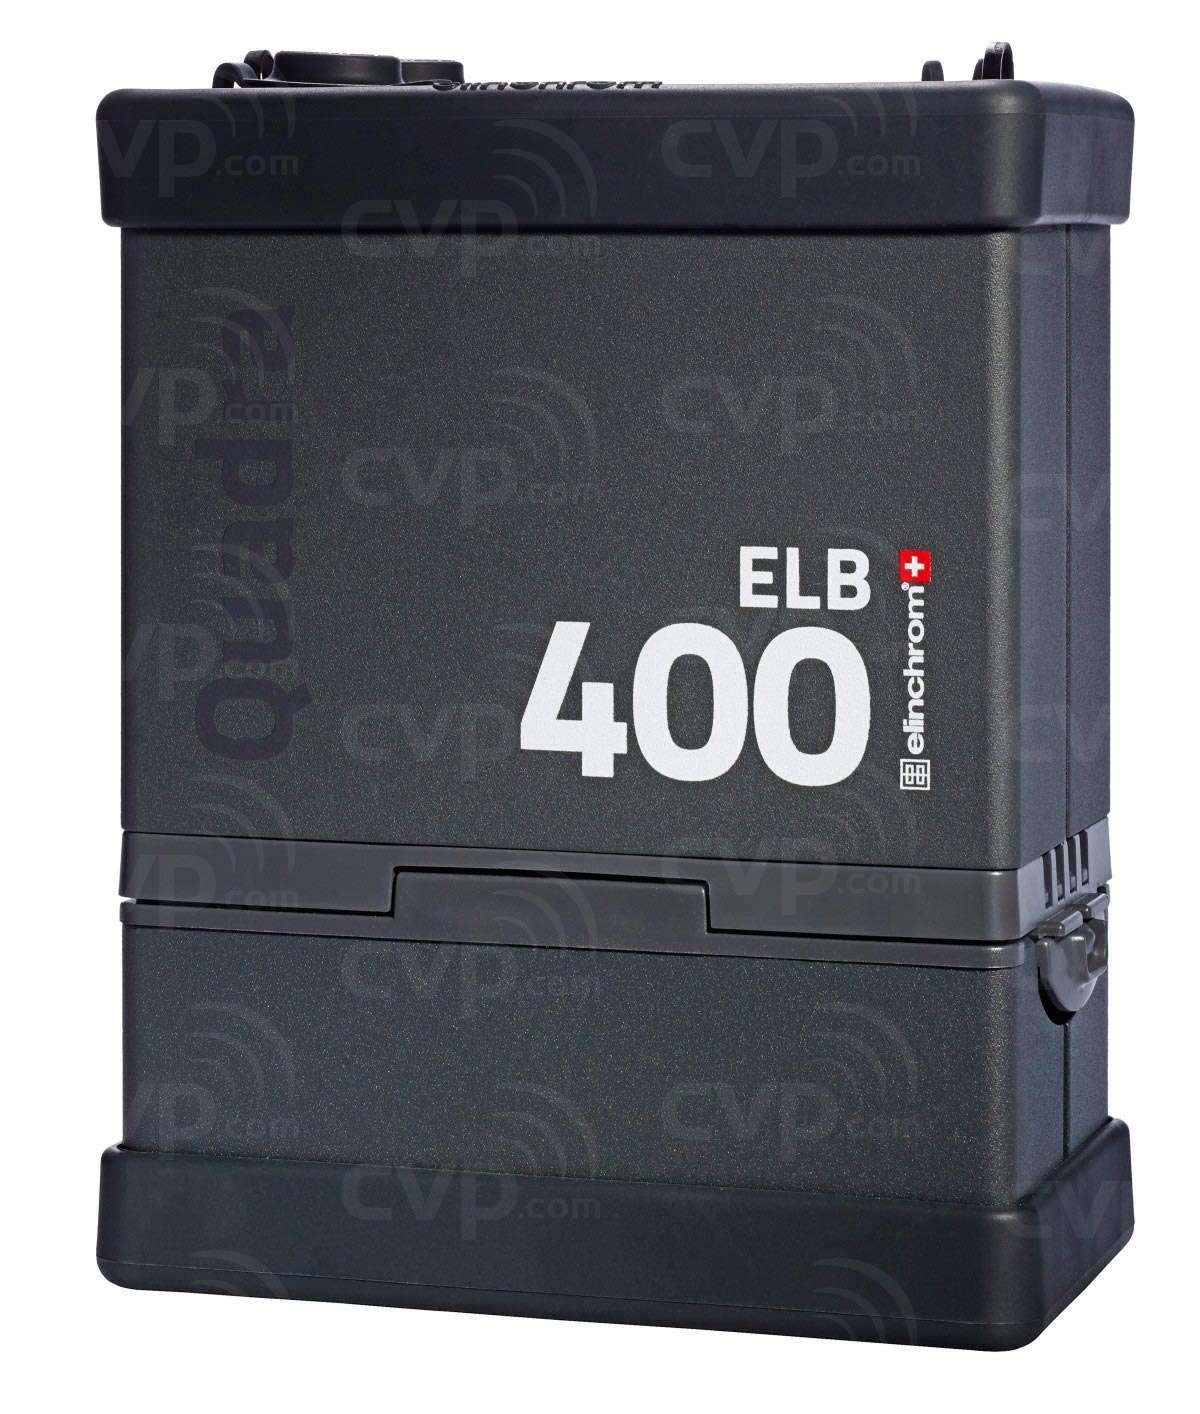 Buy Elinchrom Elb 400 Living Light Set Including Flash Rotating 038 Flashing 230v Lights At A Glance